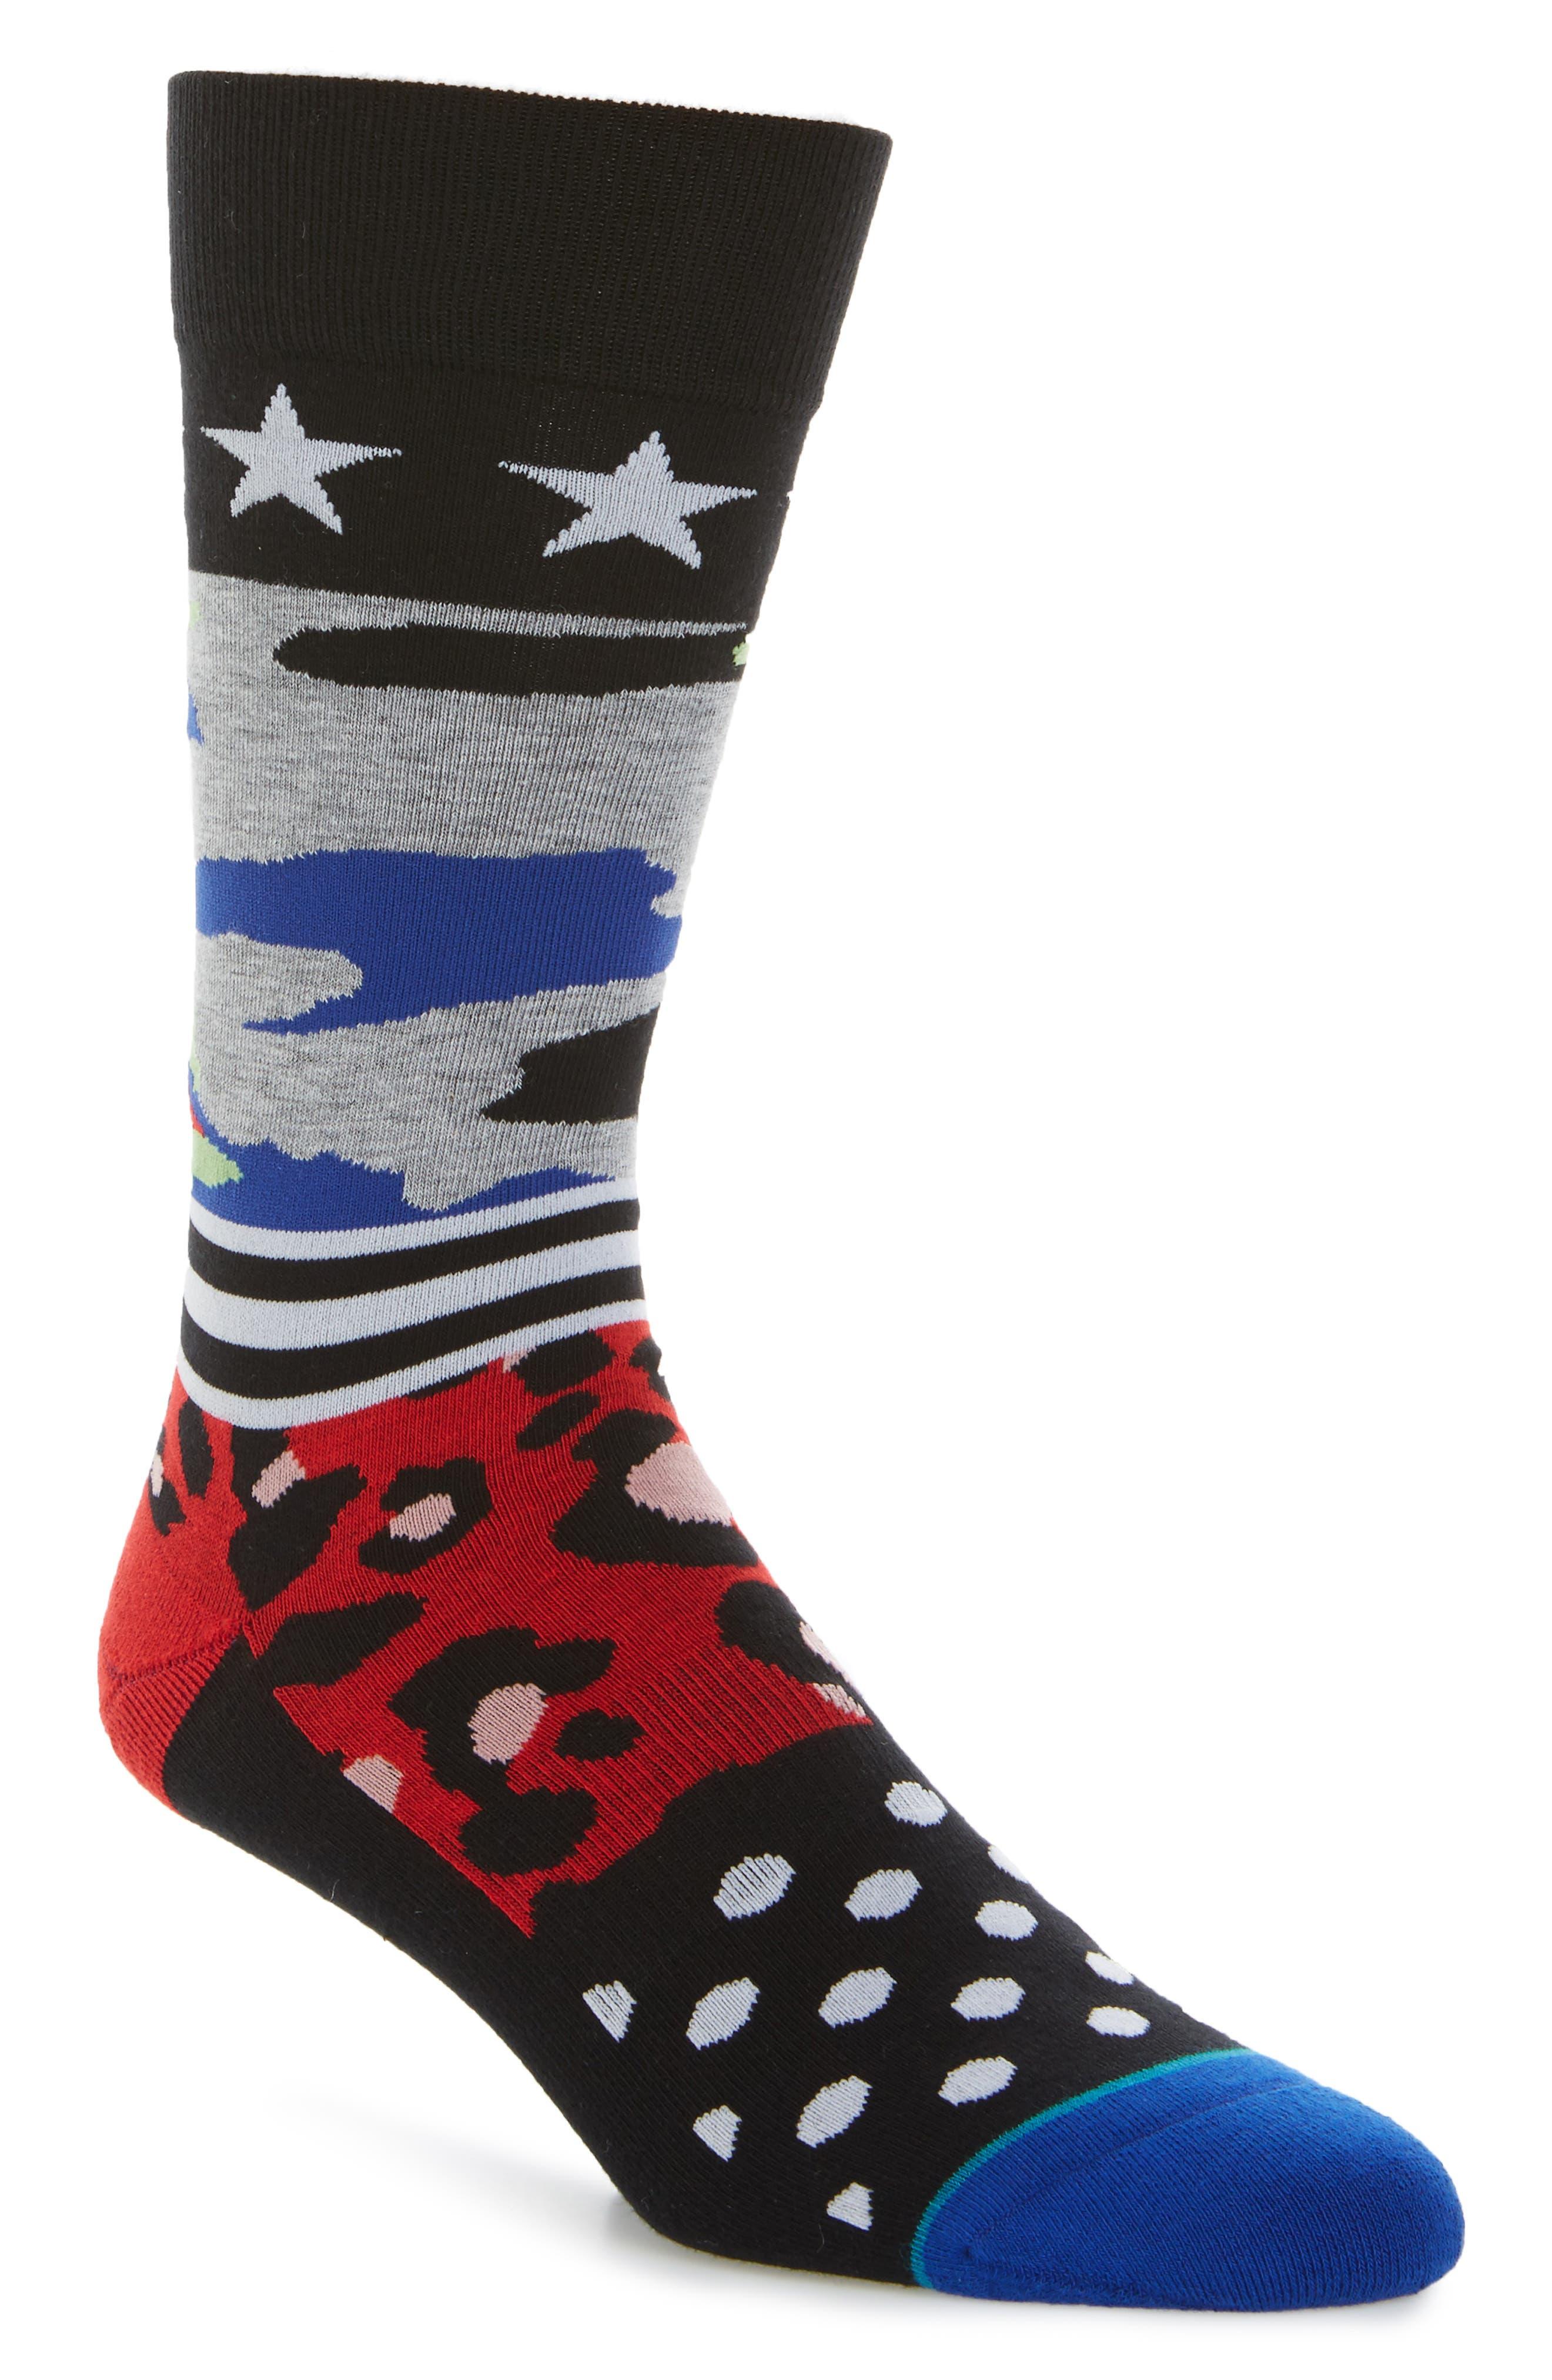 Main Image - Stance Harden Mixer Socks